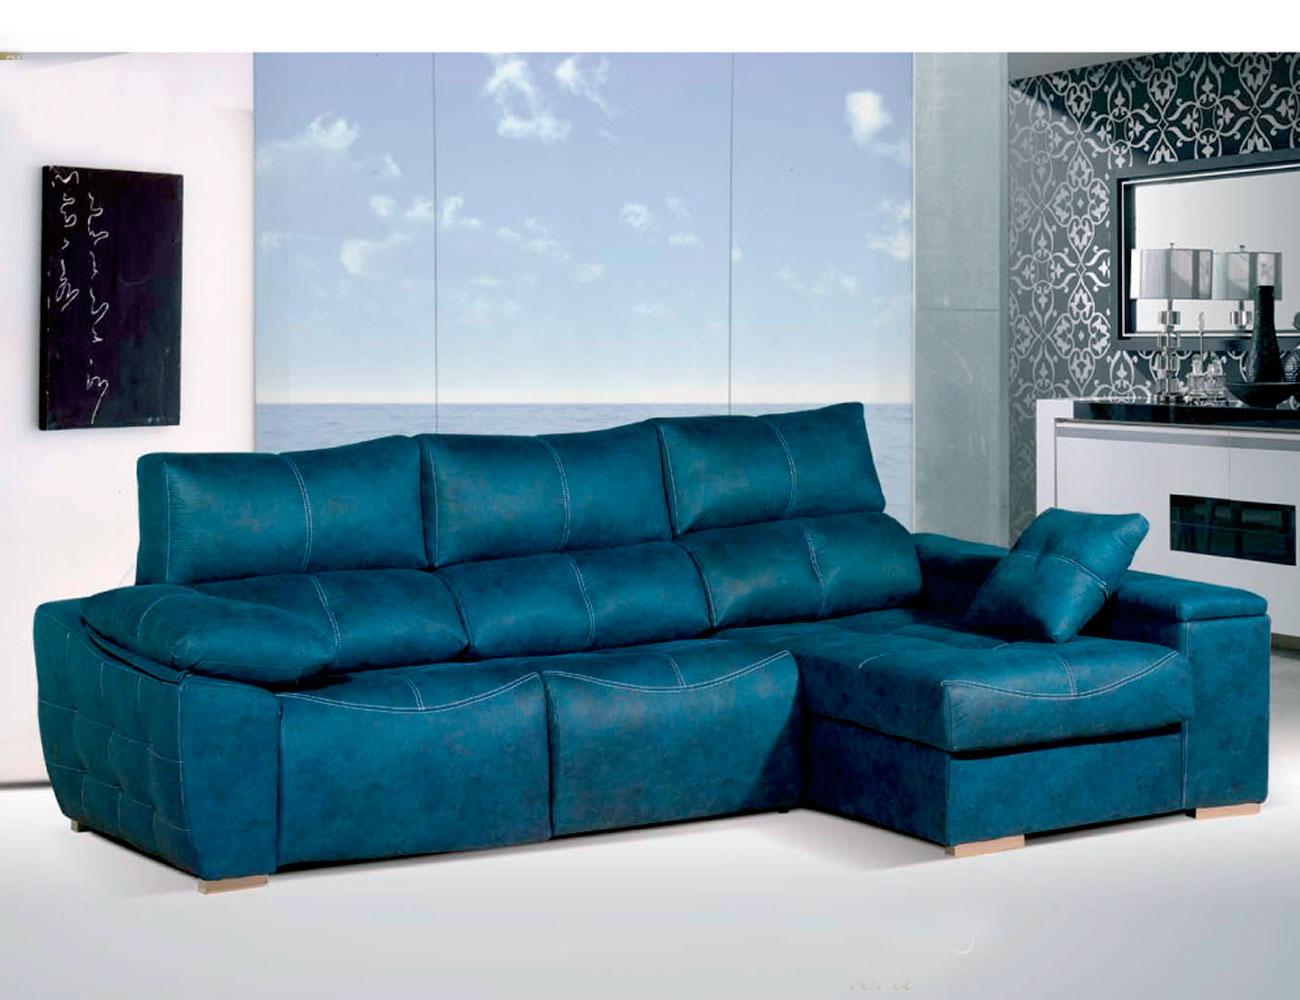 Sofa chaiselongue relax 2 motores anti manchas turquesa9